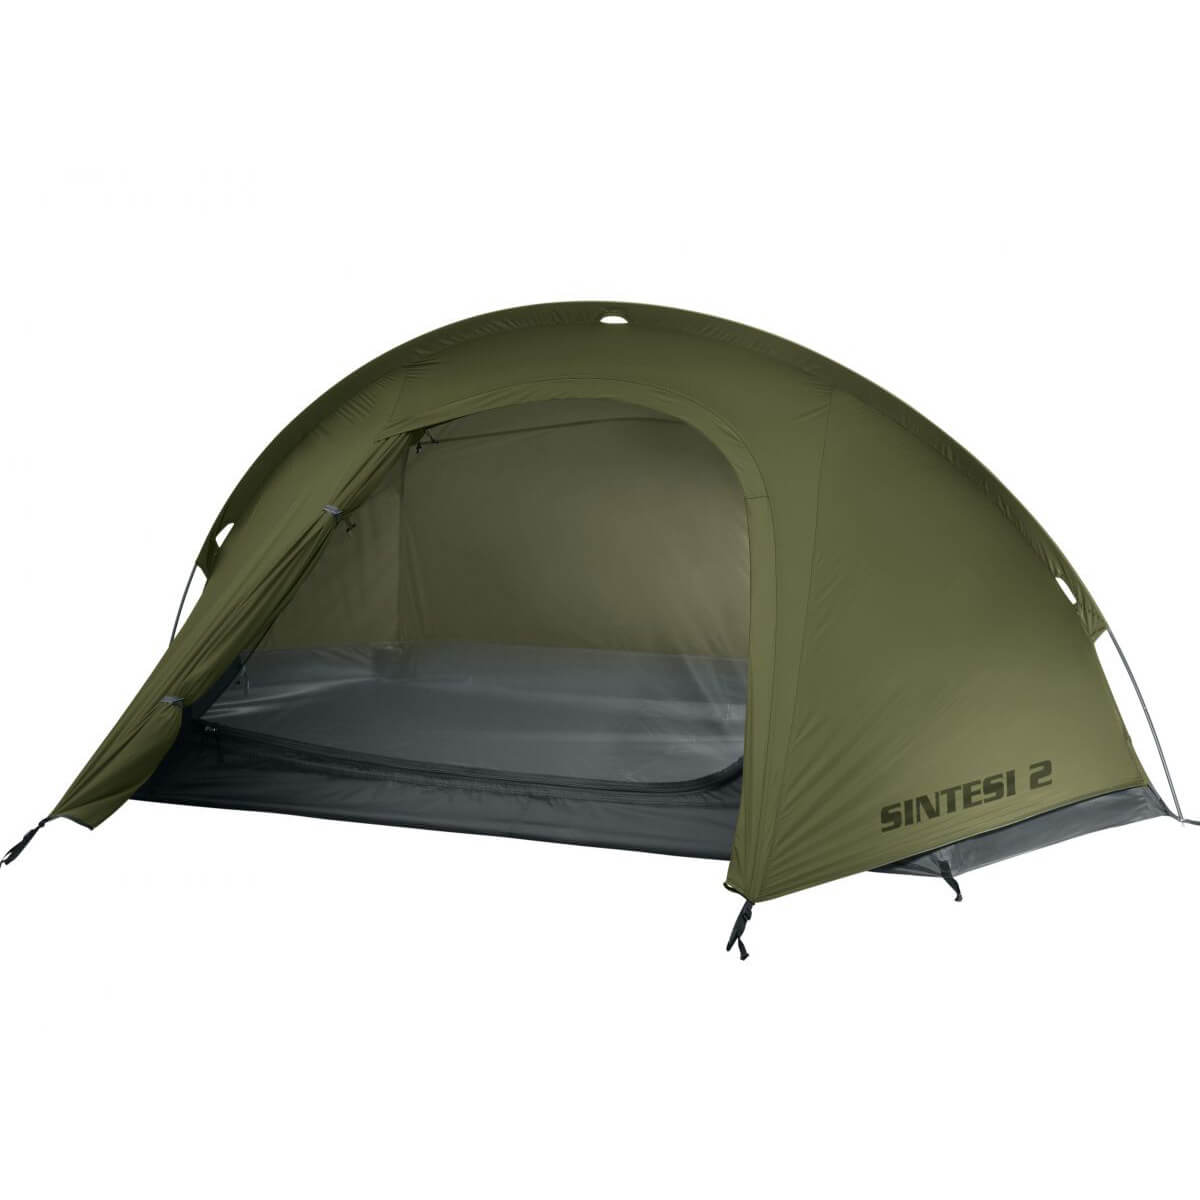 ferrino tent sling 2 green 2019